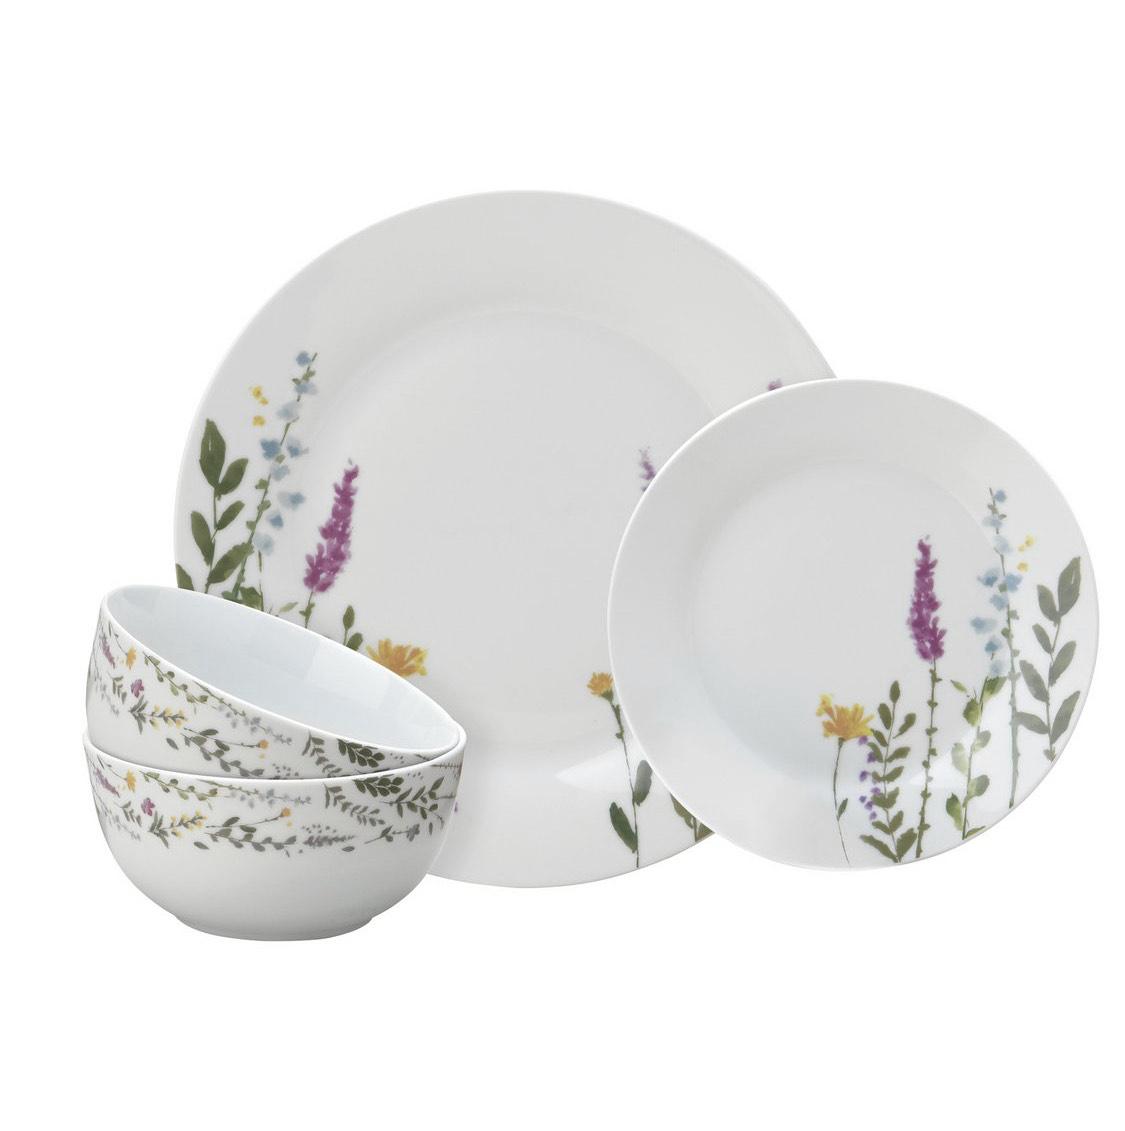 Argos Home Botanist 12 piece dinnerware set £12.50 @ Argos Free click and collect